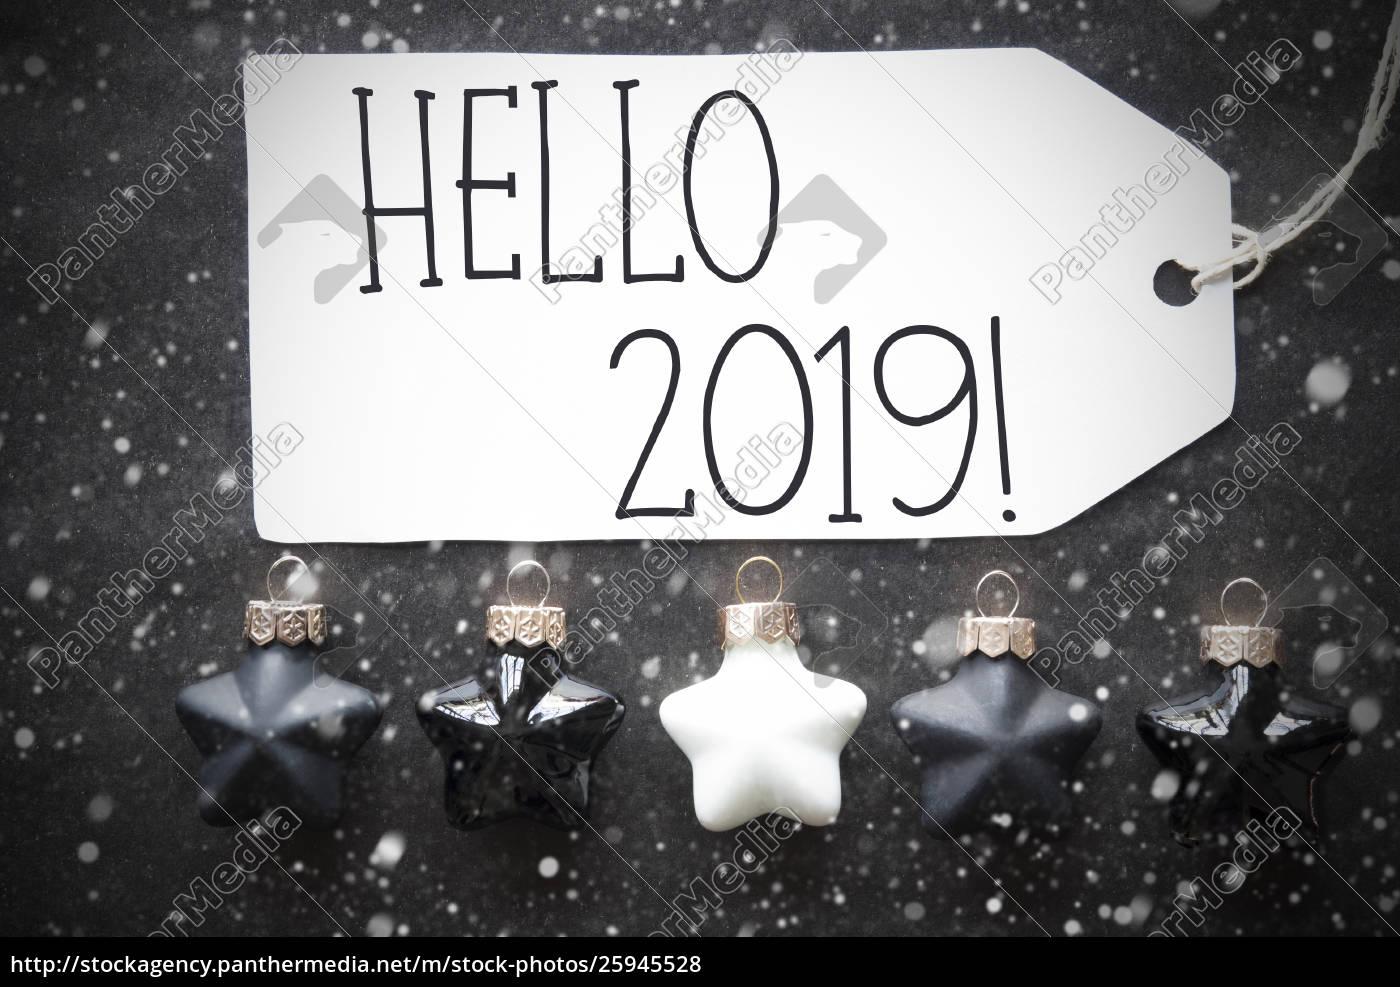 Black Christmas Balls.Royalty Free Photo 25945528 Black Christmas Balls Snowflakes Text Hello 2019